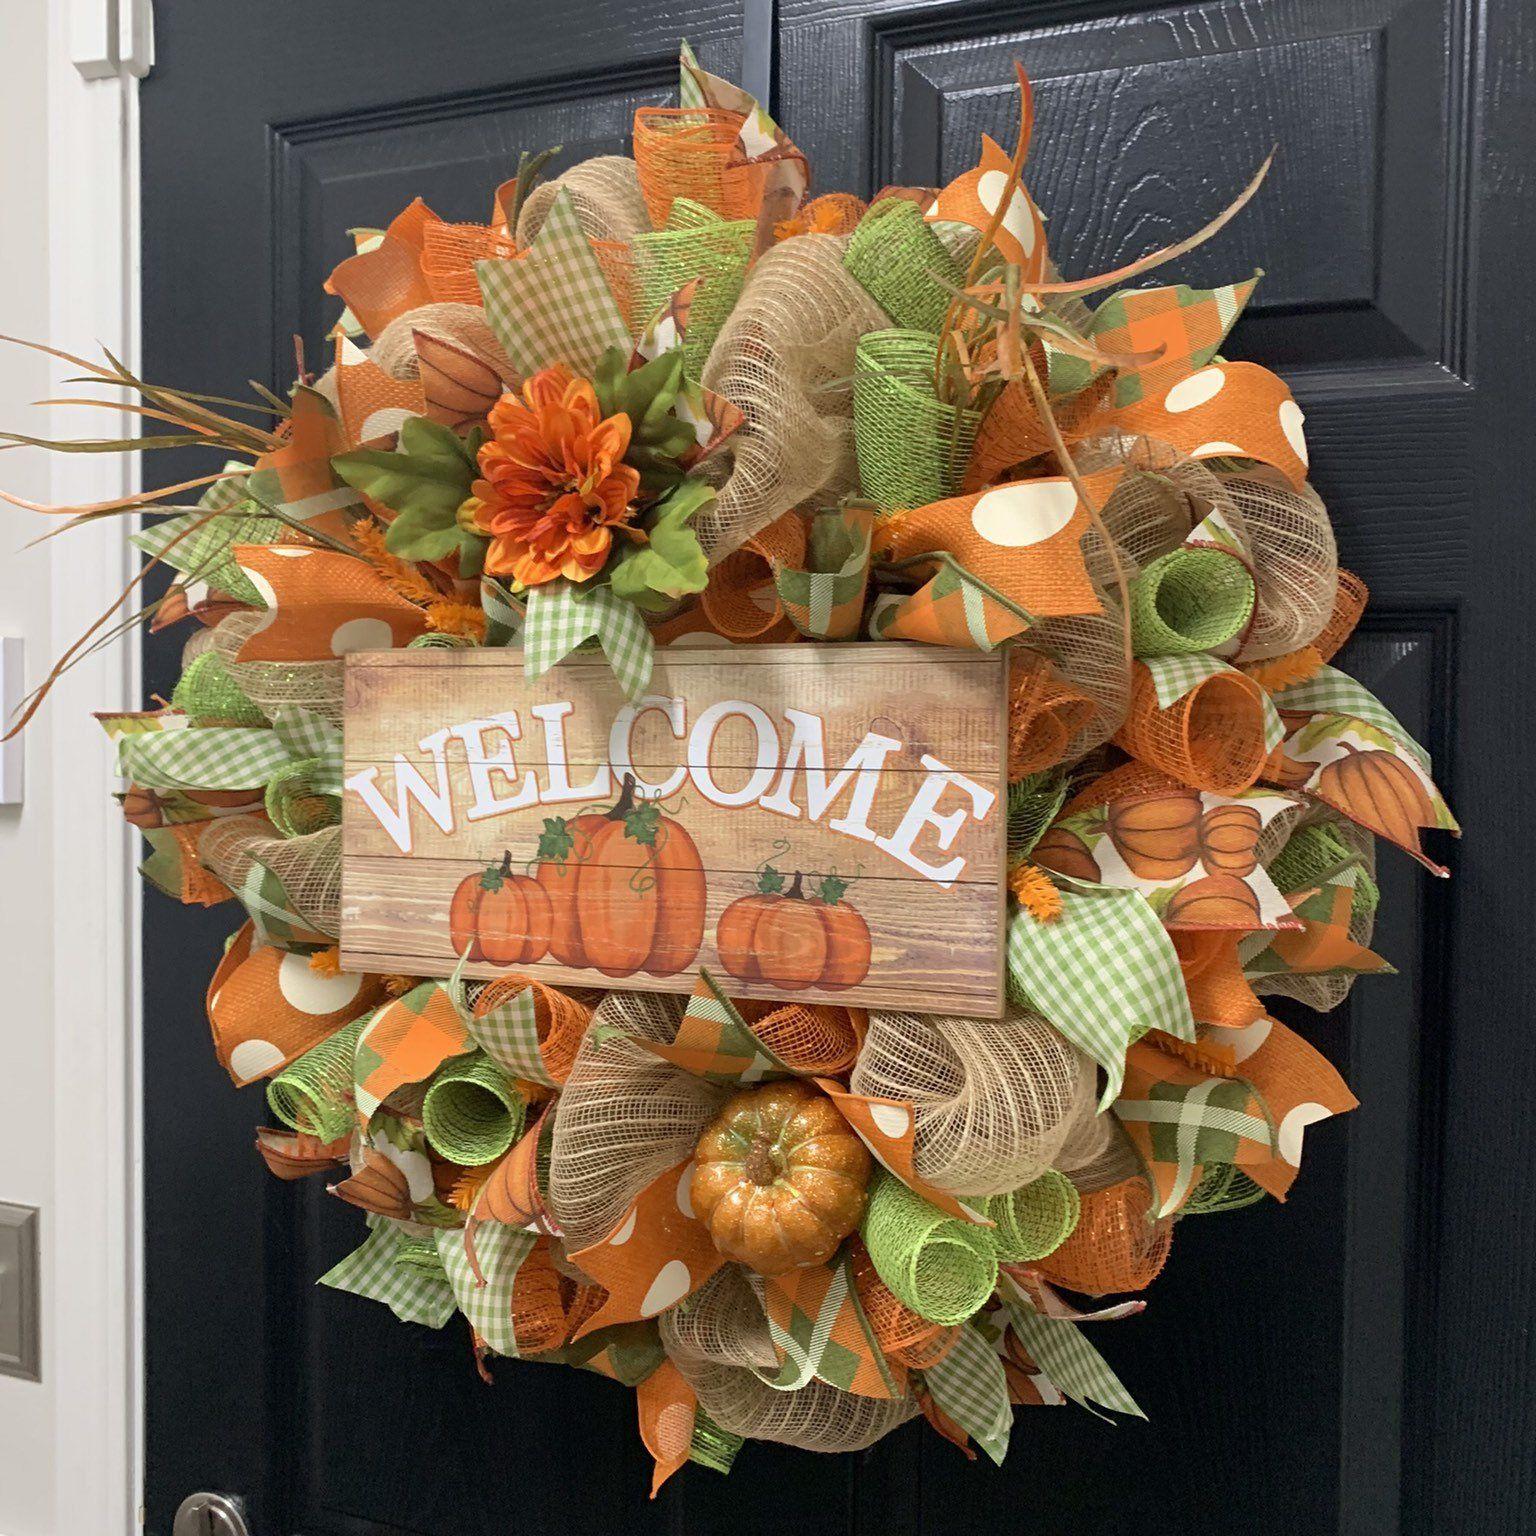 Photo of Pumpkin wreath, fall wreath, autumn wreath, Pumpkin welcome wreath, welcome wreath, fall decor,